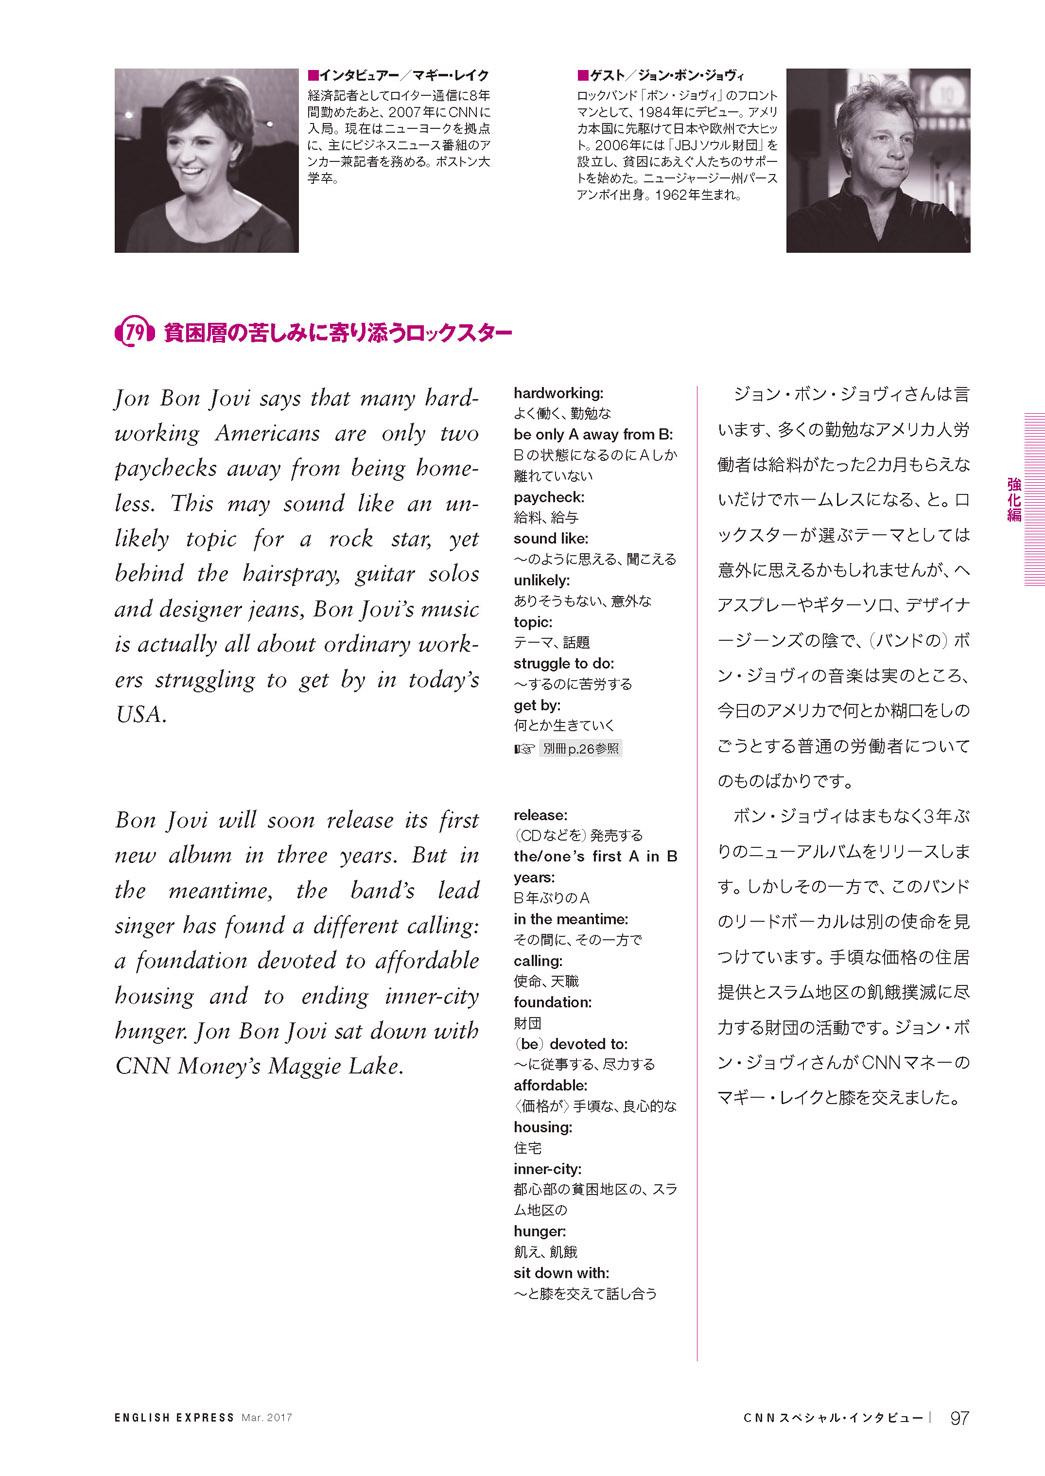 "◆CNNスペシャル・インタビュー#br#貧困層を救う「ロック」な方法 ジョン・ボン・ジョヴィ#br#》》音声試聴は<a href=""mms://016.mediaimage.jp/asahipress/ee1703b.wma"" class=""txt1158b0"">こちら</a>をクリック!"